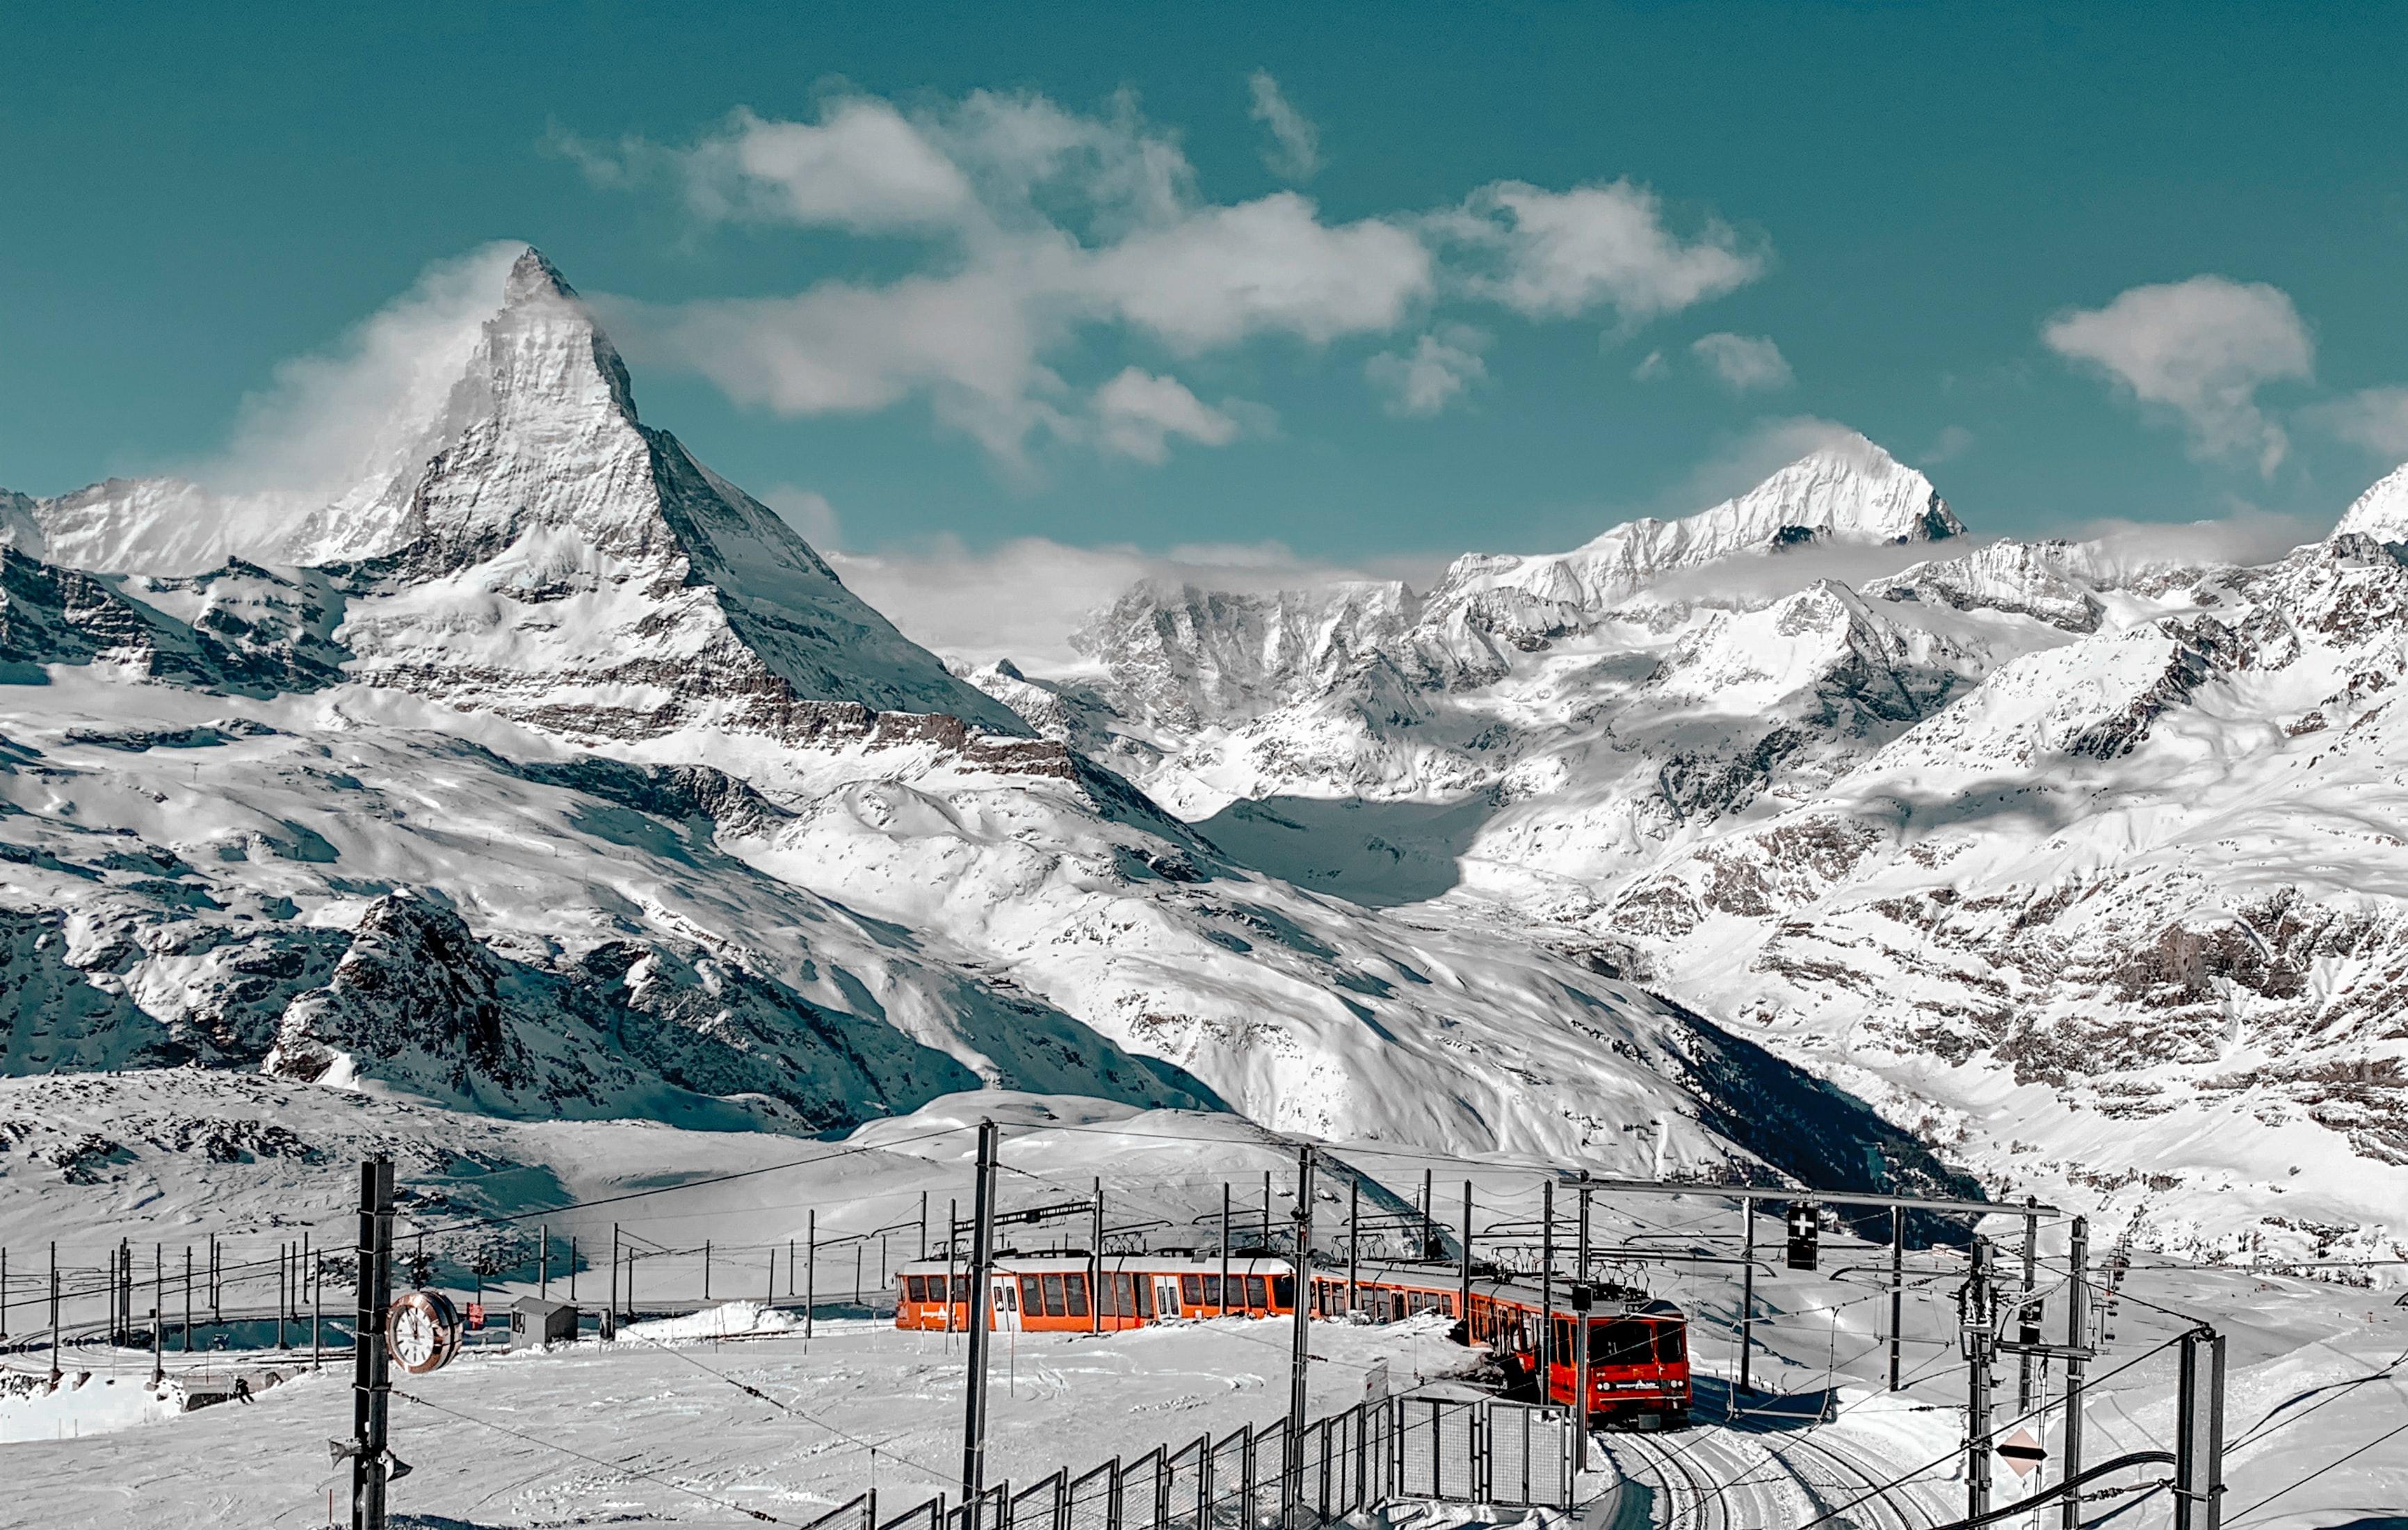 Zermatt, Switzerland for Honeymoon